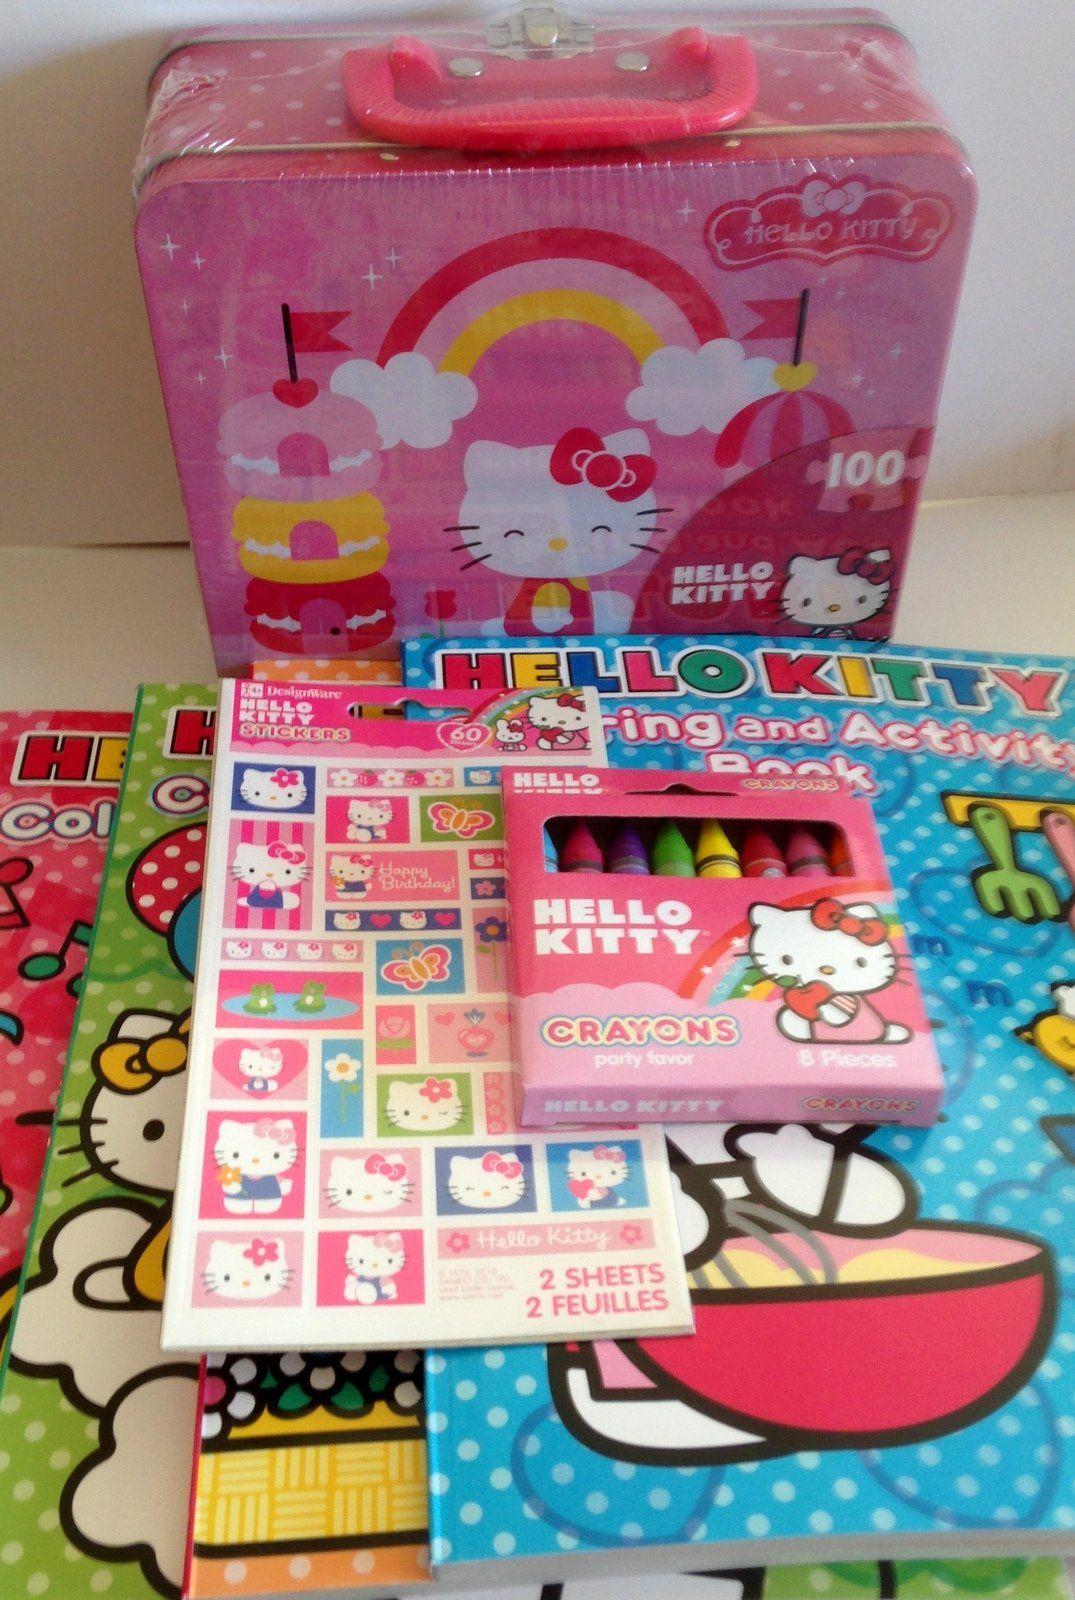 gift set 4 hello kitty jumbo coloring activity books, crayons